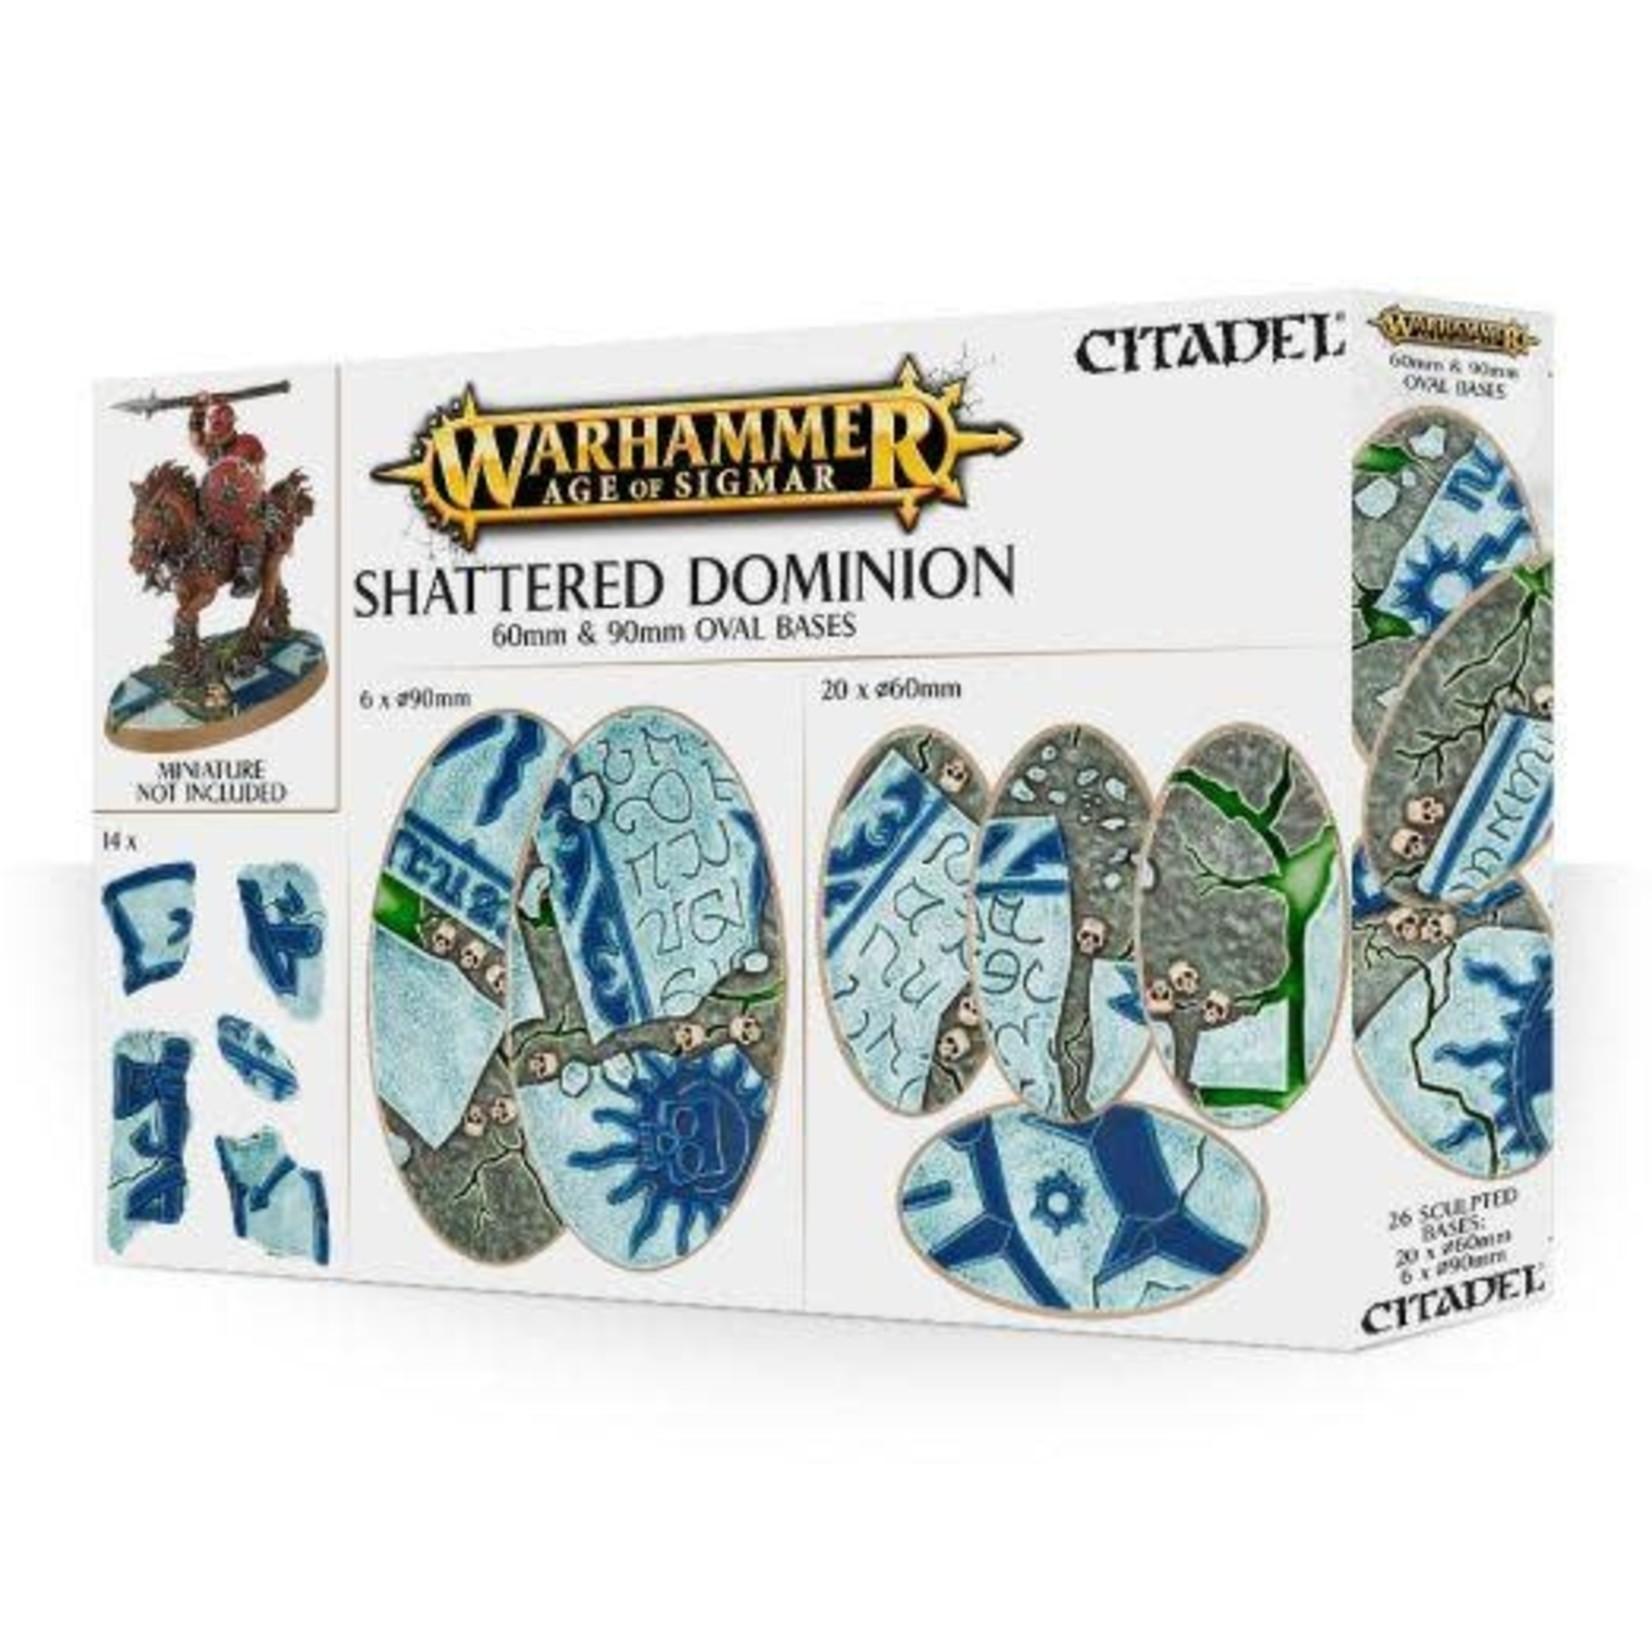 Games Workshop Shattered Dominion: 60 & 90mm Oval Bases